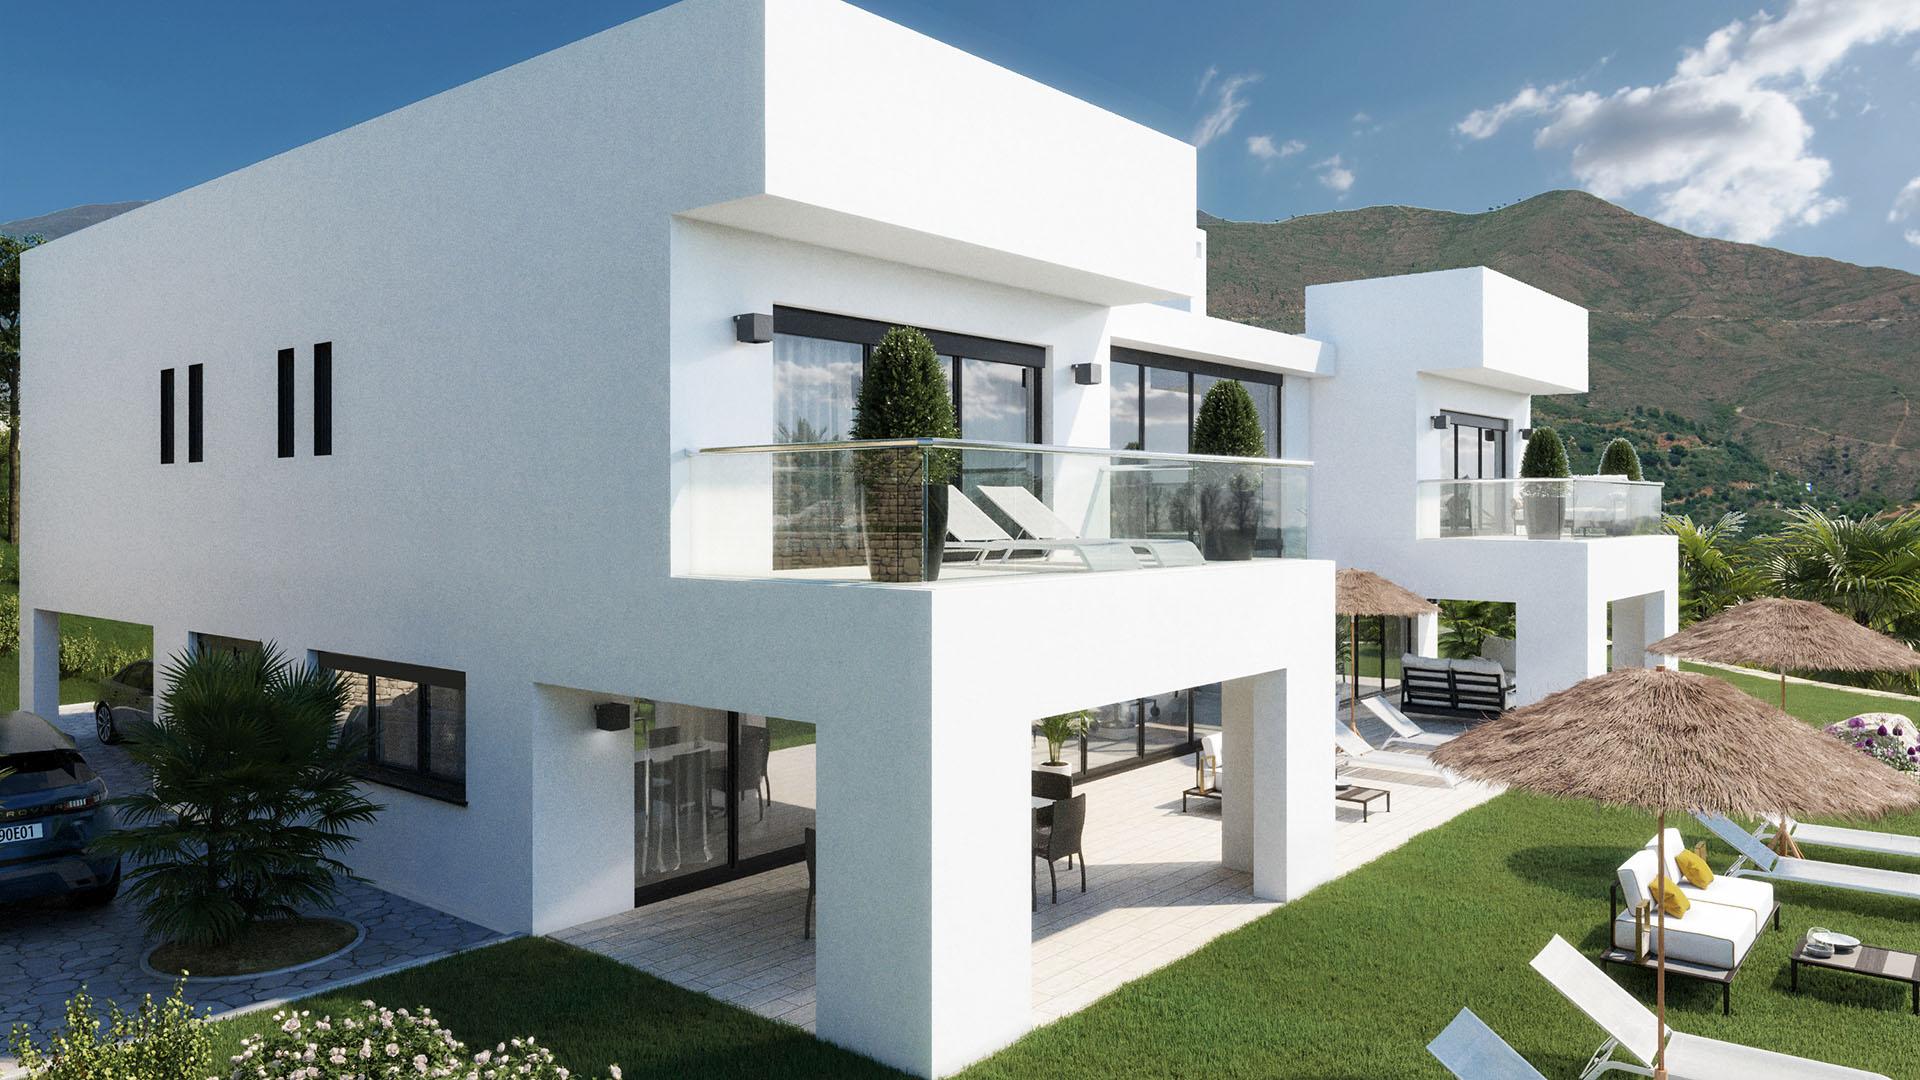 Villa La Mairena 1303: Indrukwekkende luxe villa in La Mairena, Oost Marbella